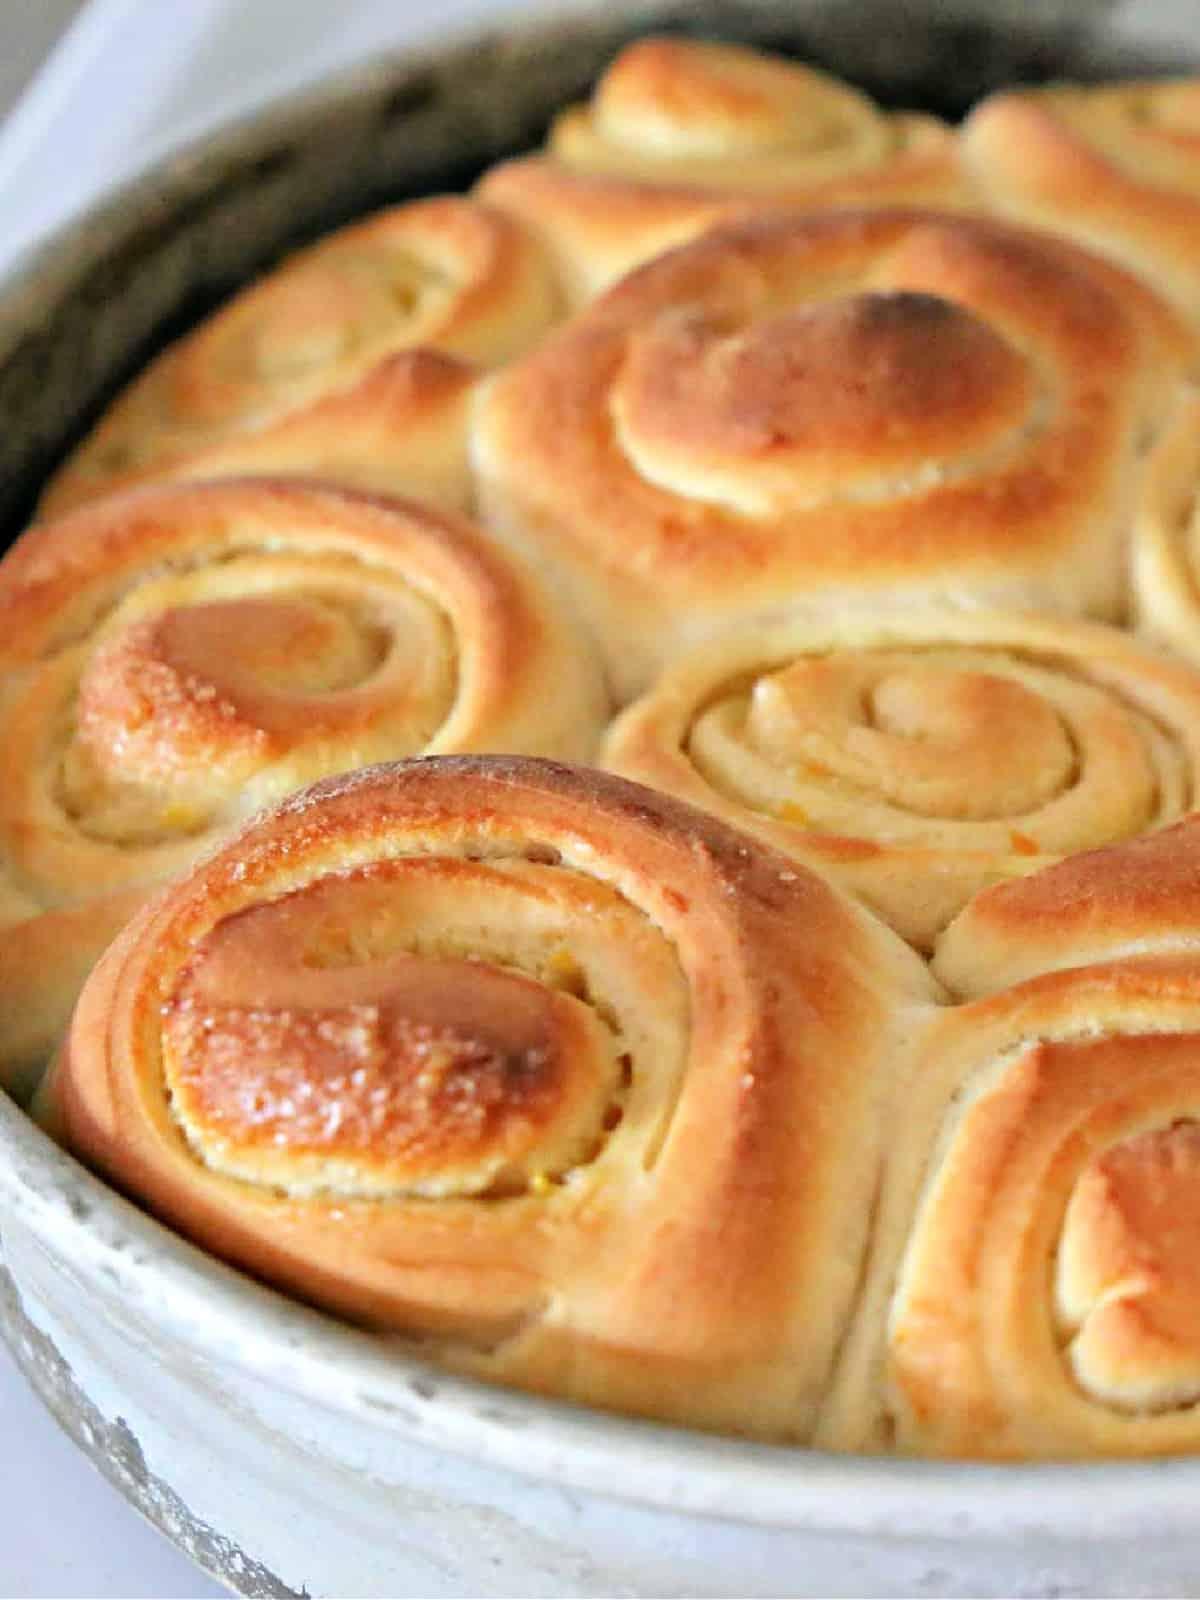 pan of baked orange rolls